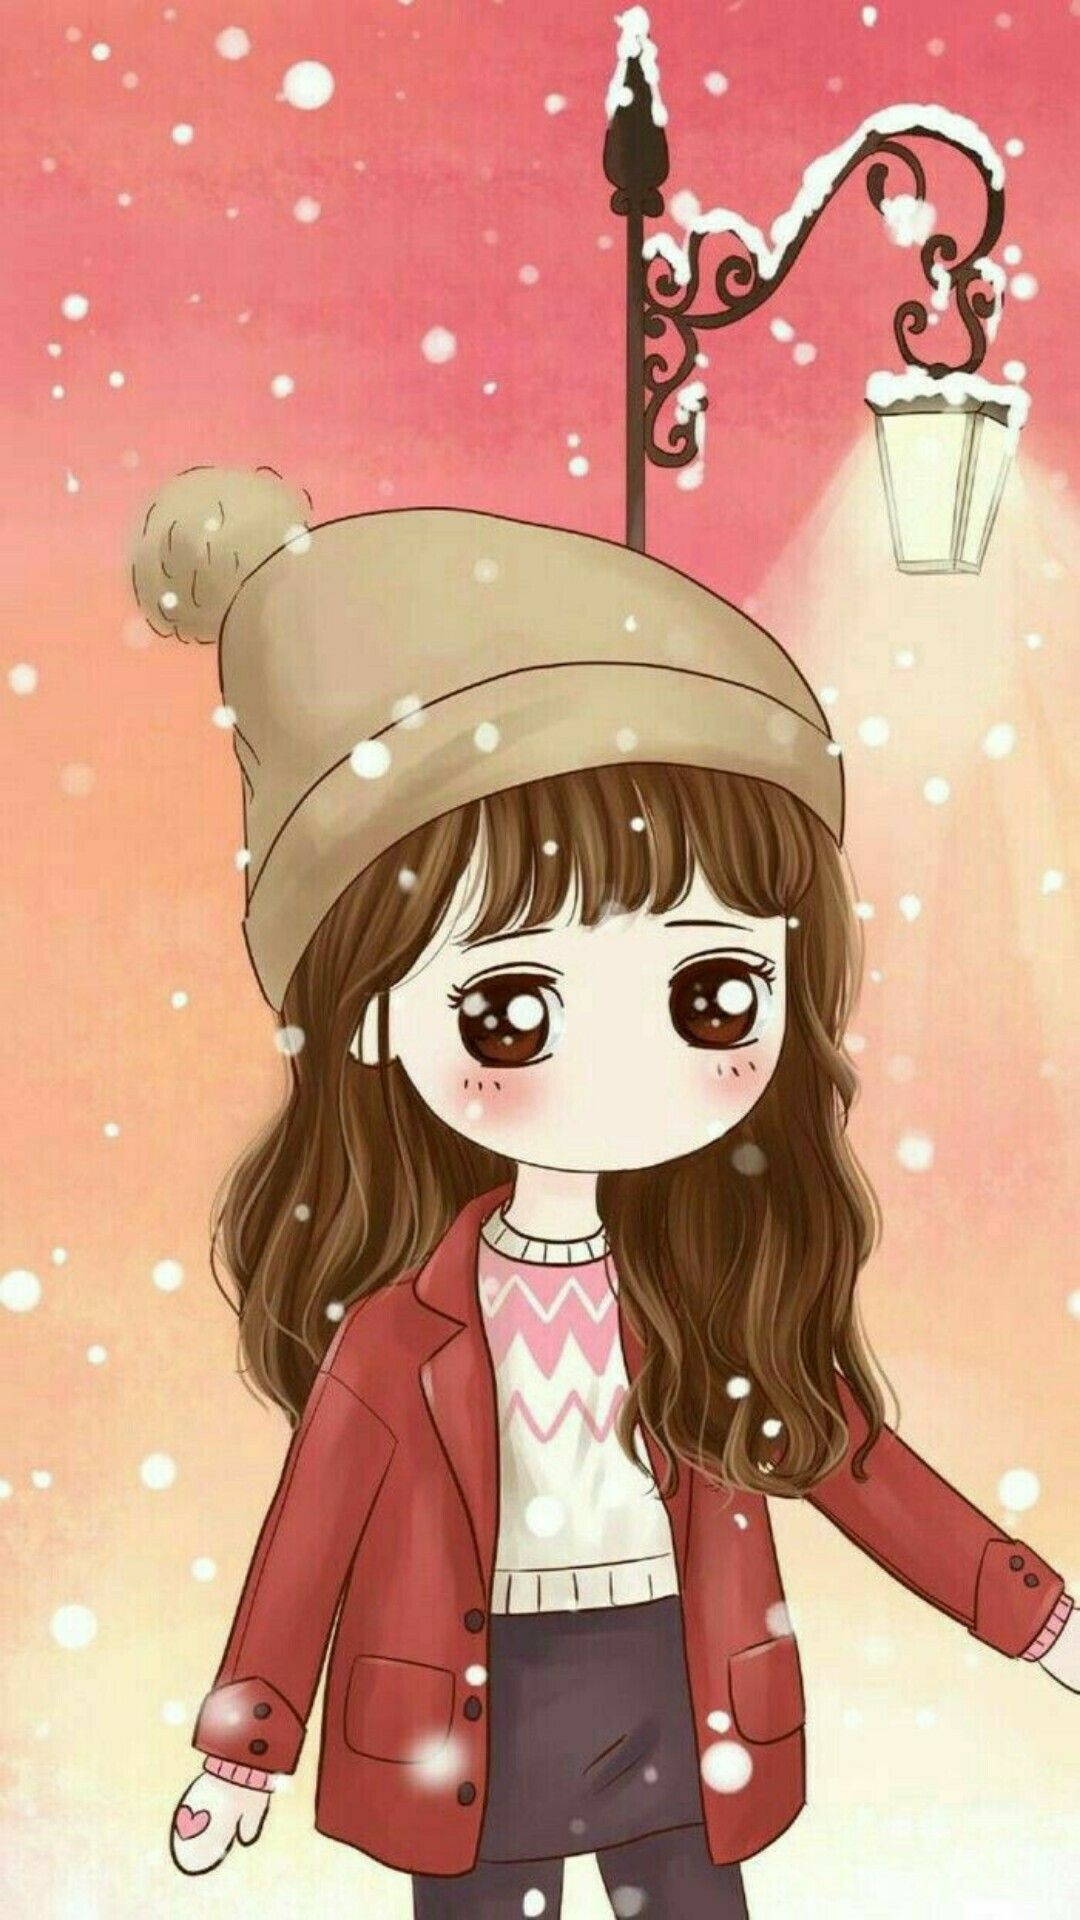 Pin oleh Hendie Purwiliarto di Phone Backgrounds Cartoon